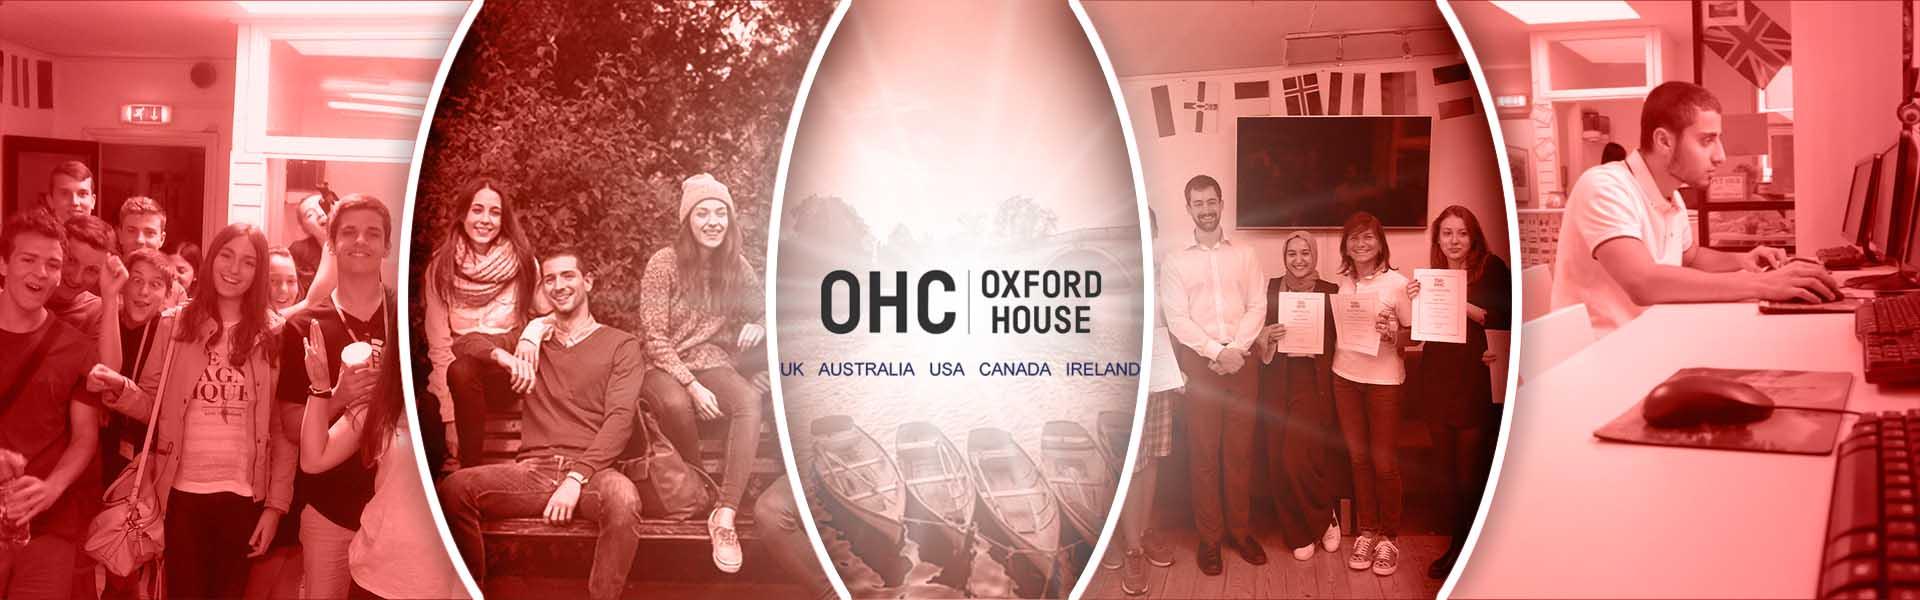 Oxford House College (OHC) London Richmond Dil Okulu